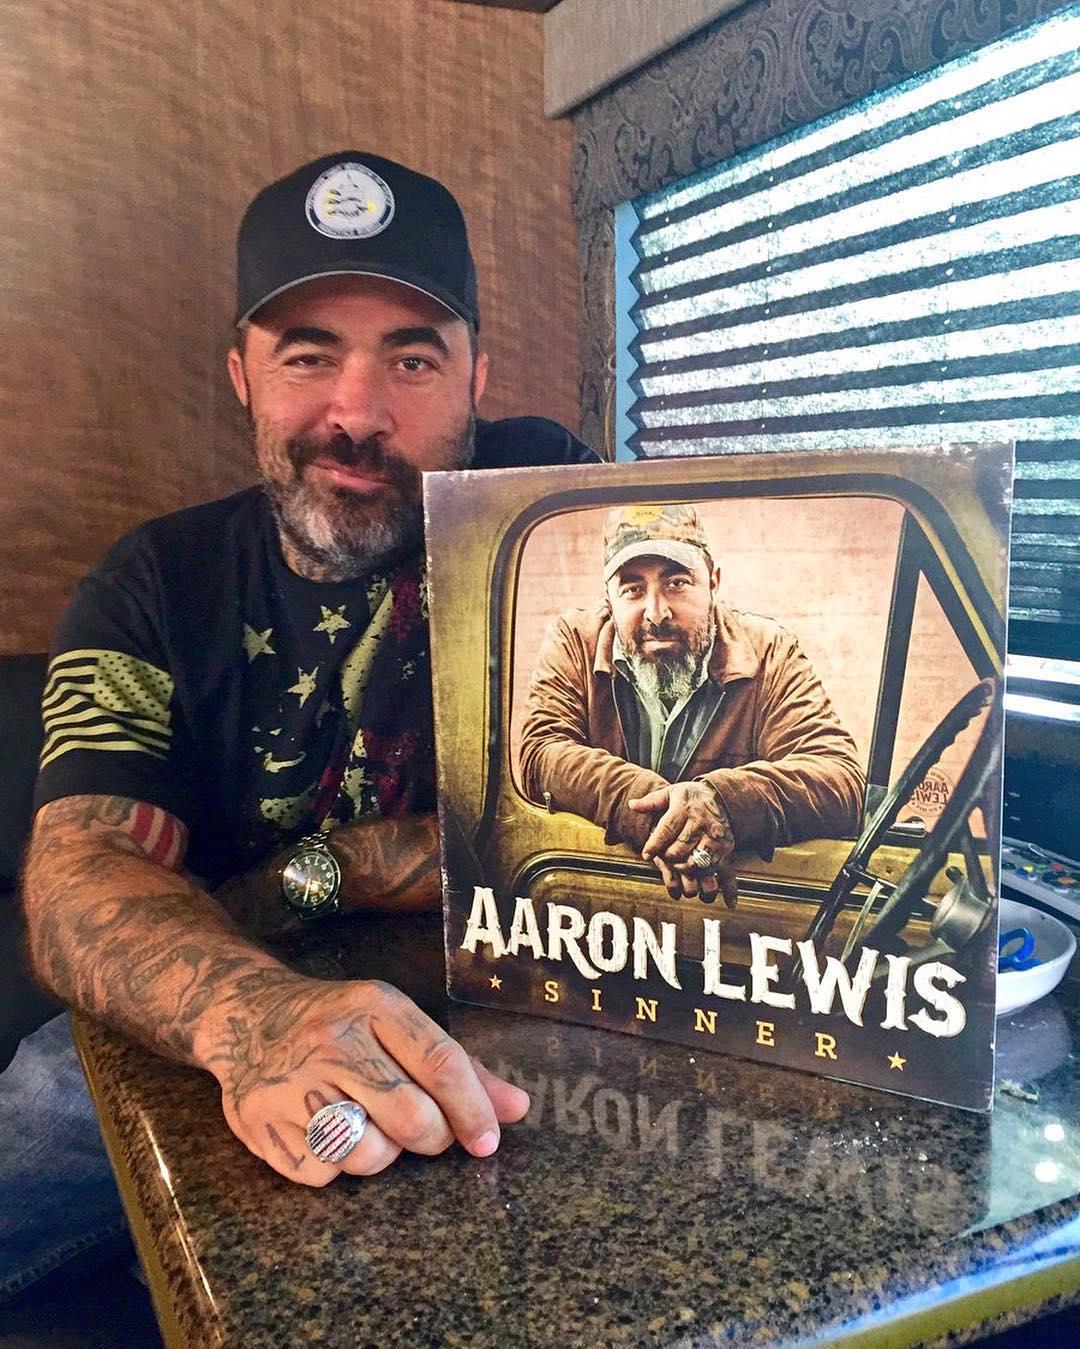 Aaron Lewis Instagram username